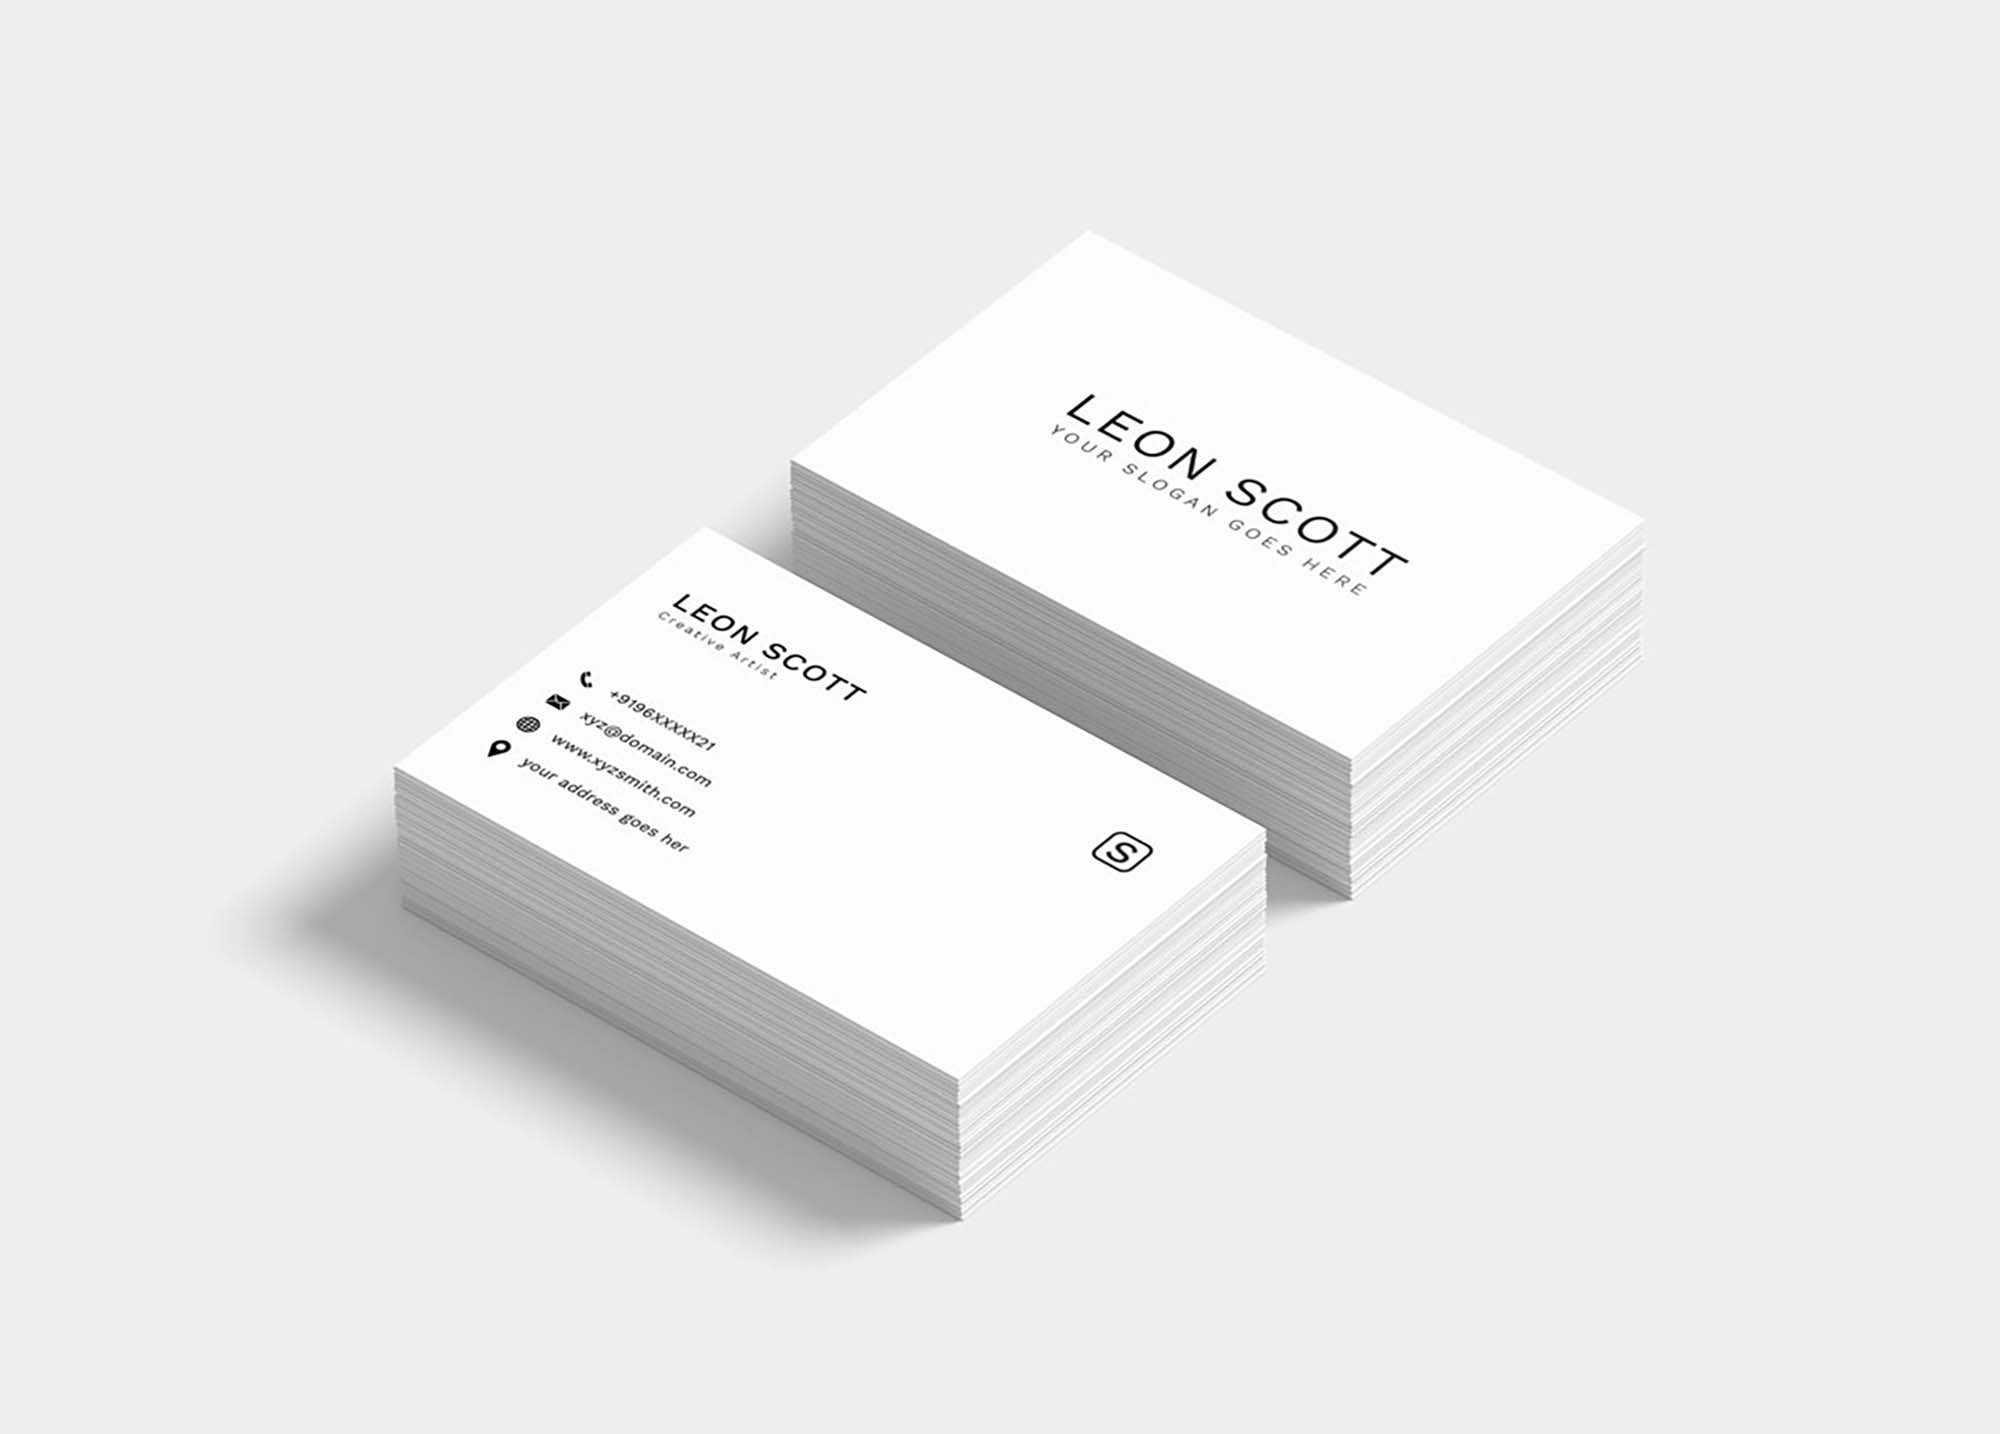 Free Minimal Elegant Business Card Template (Psd) Regarding Create Business Card Template Photoshop